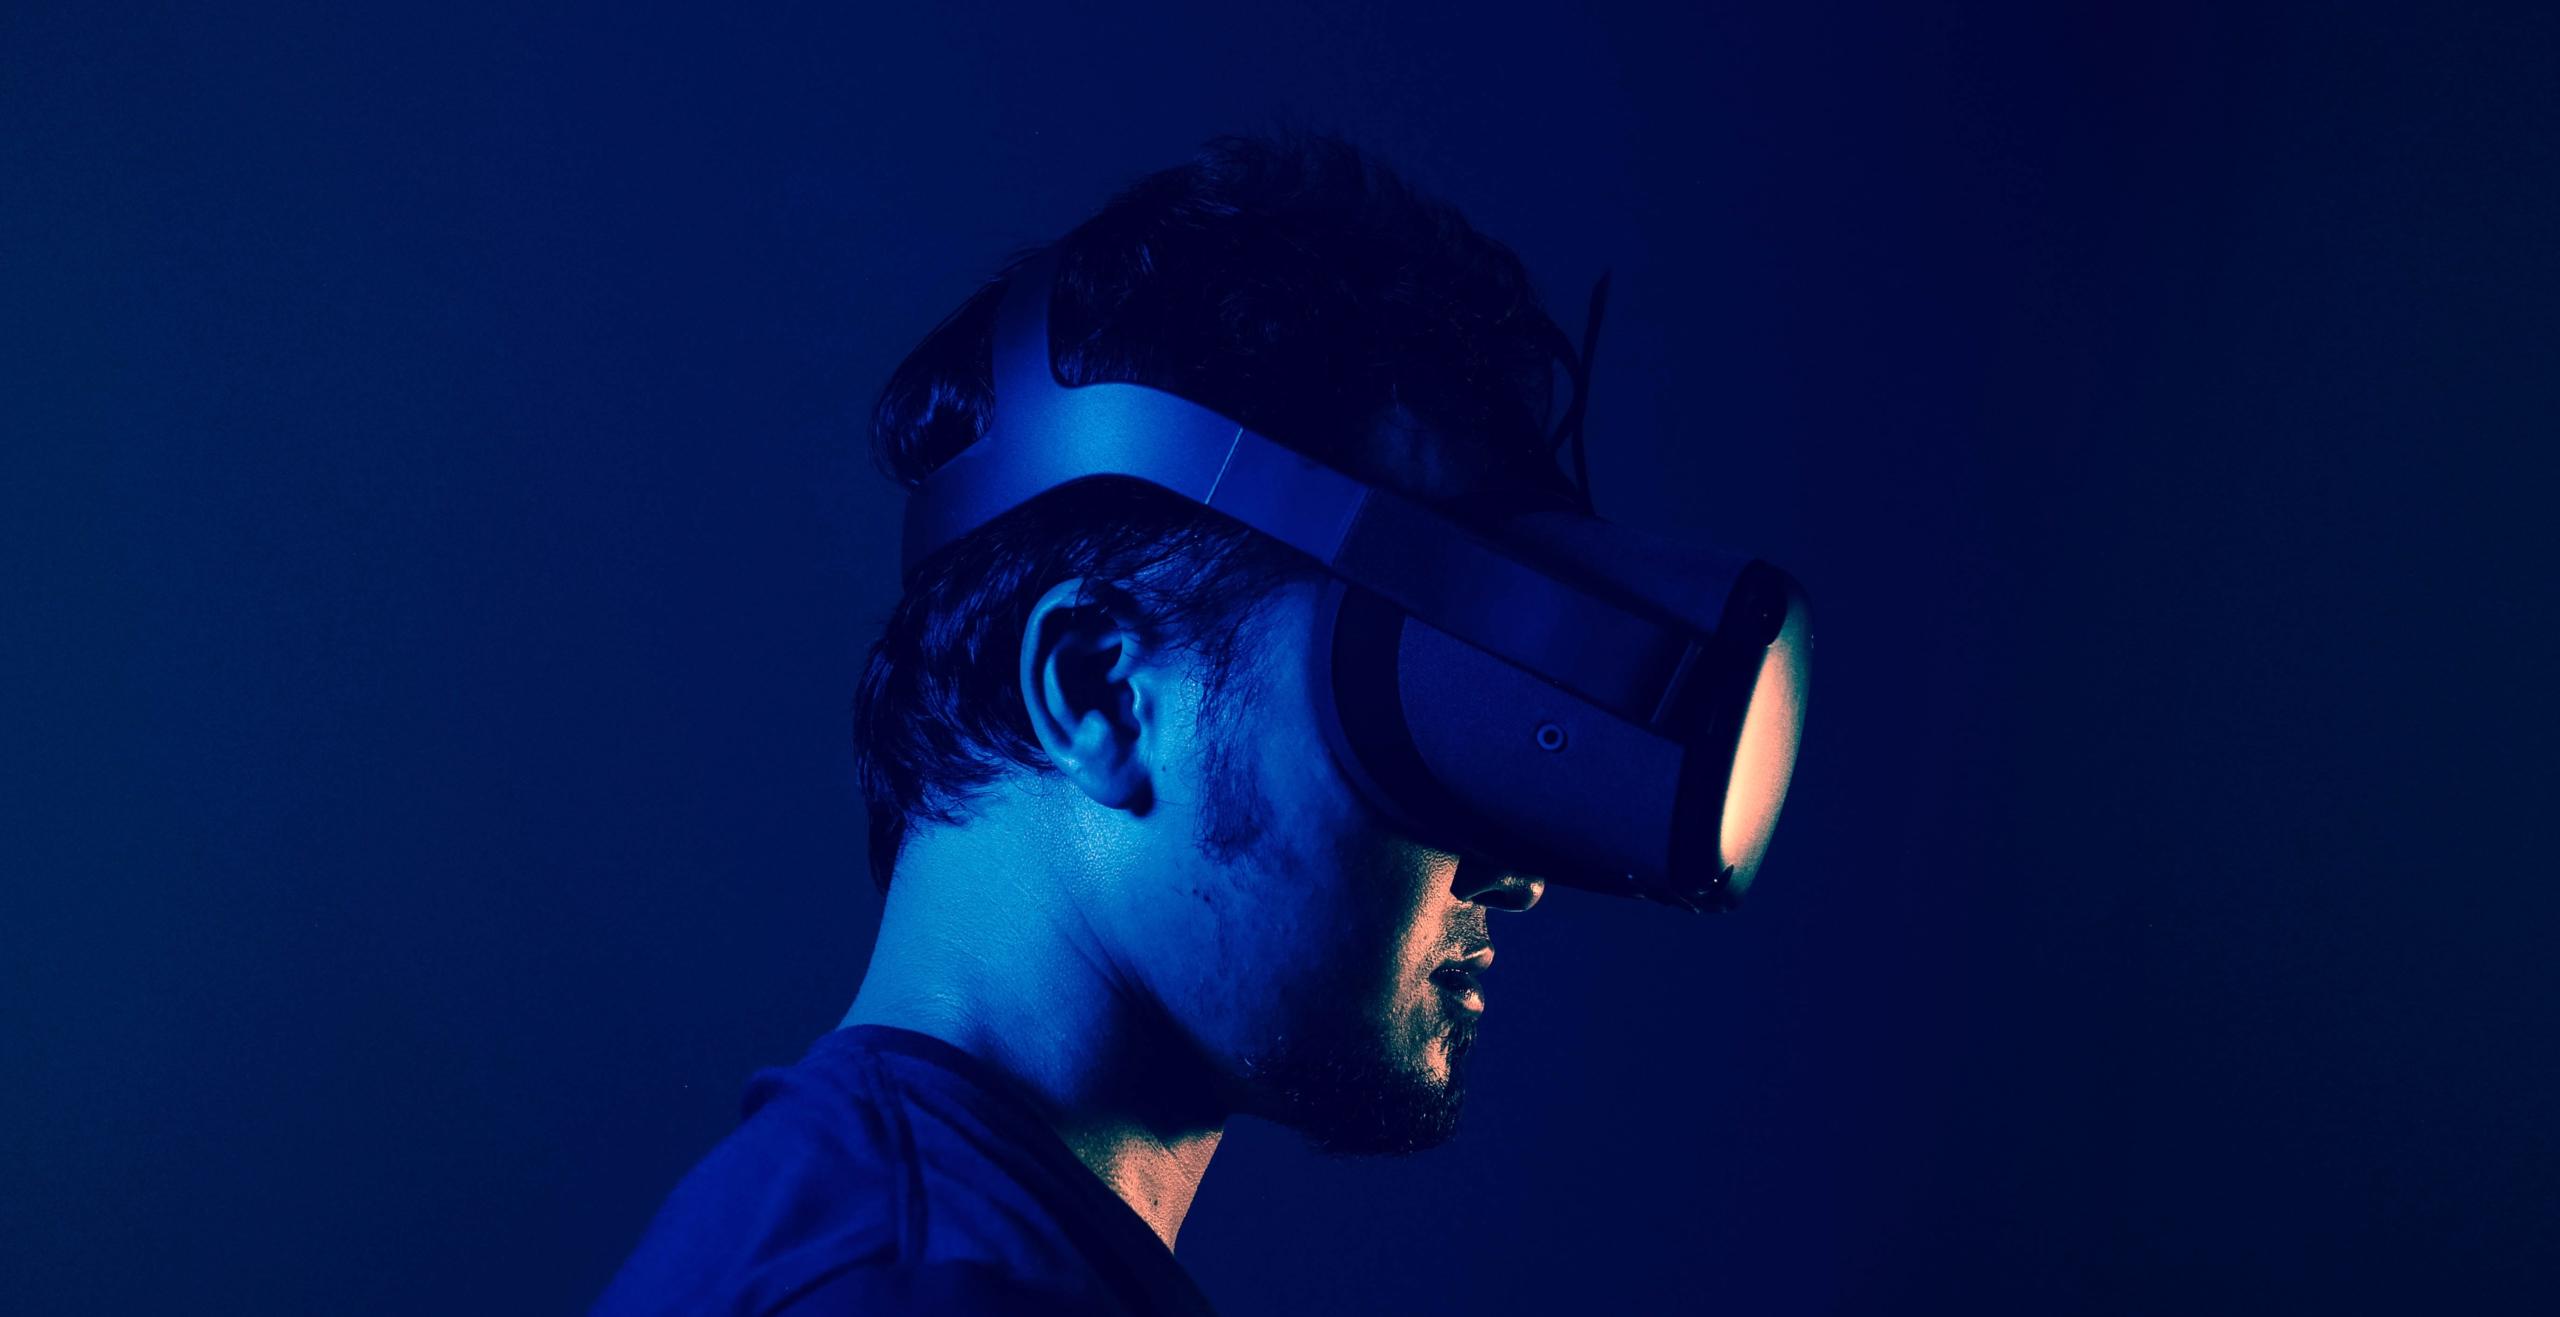 virtual reality check: close to mainstream adoption